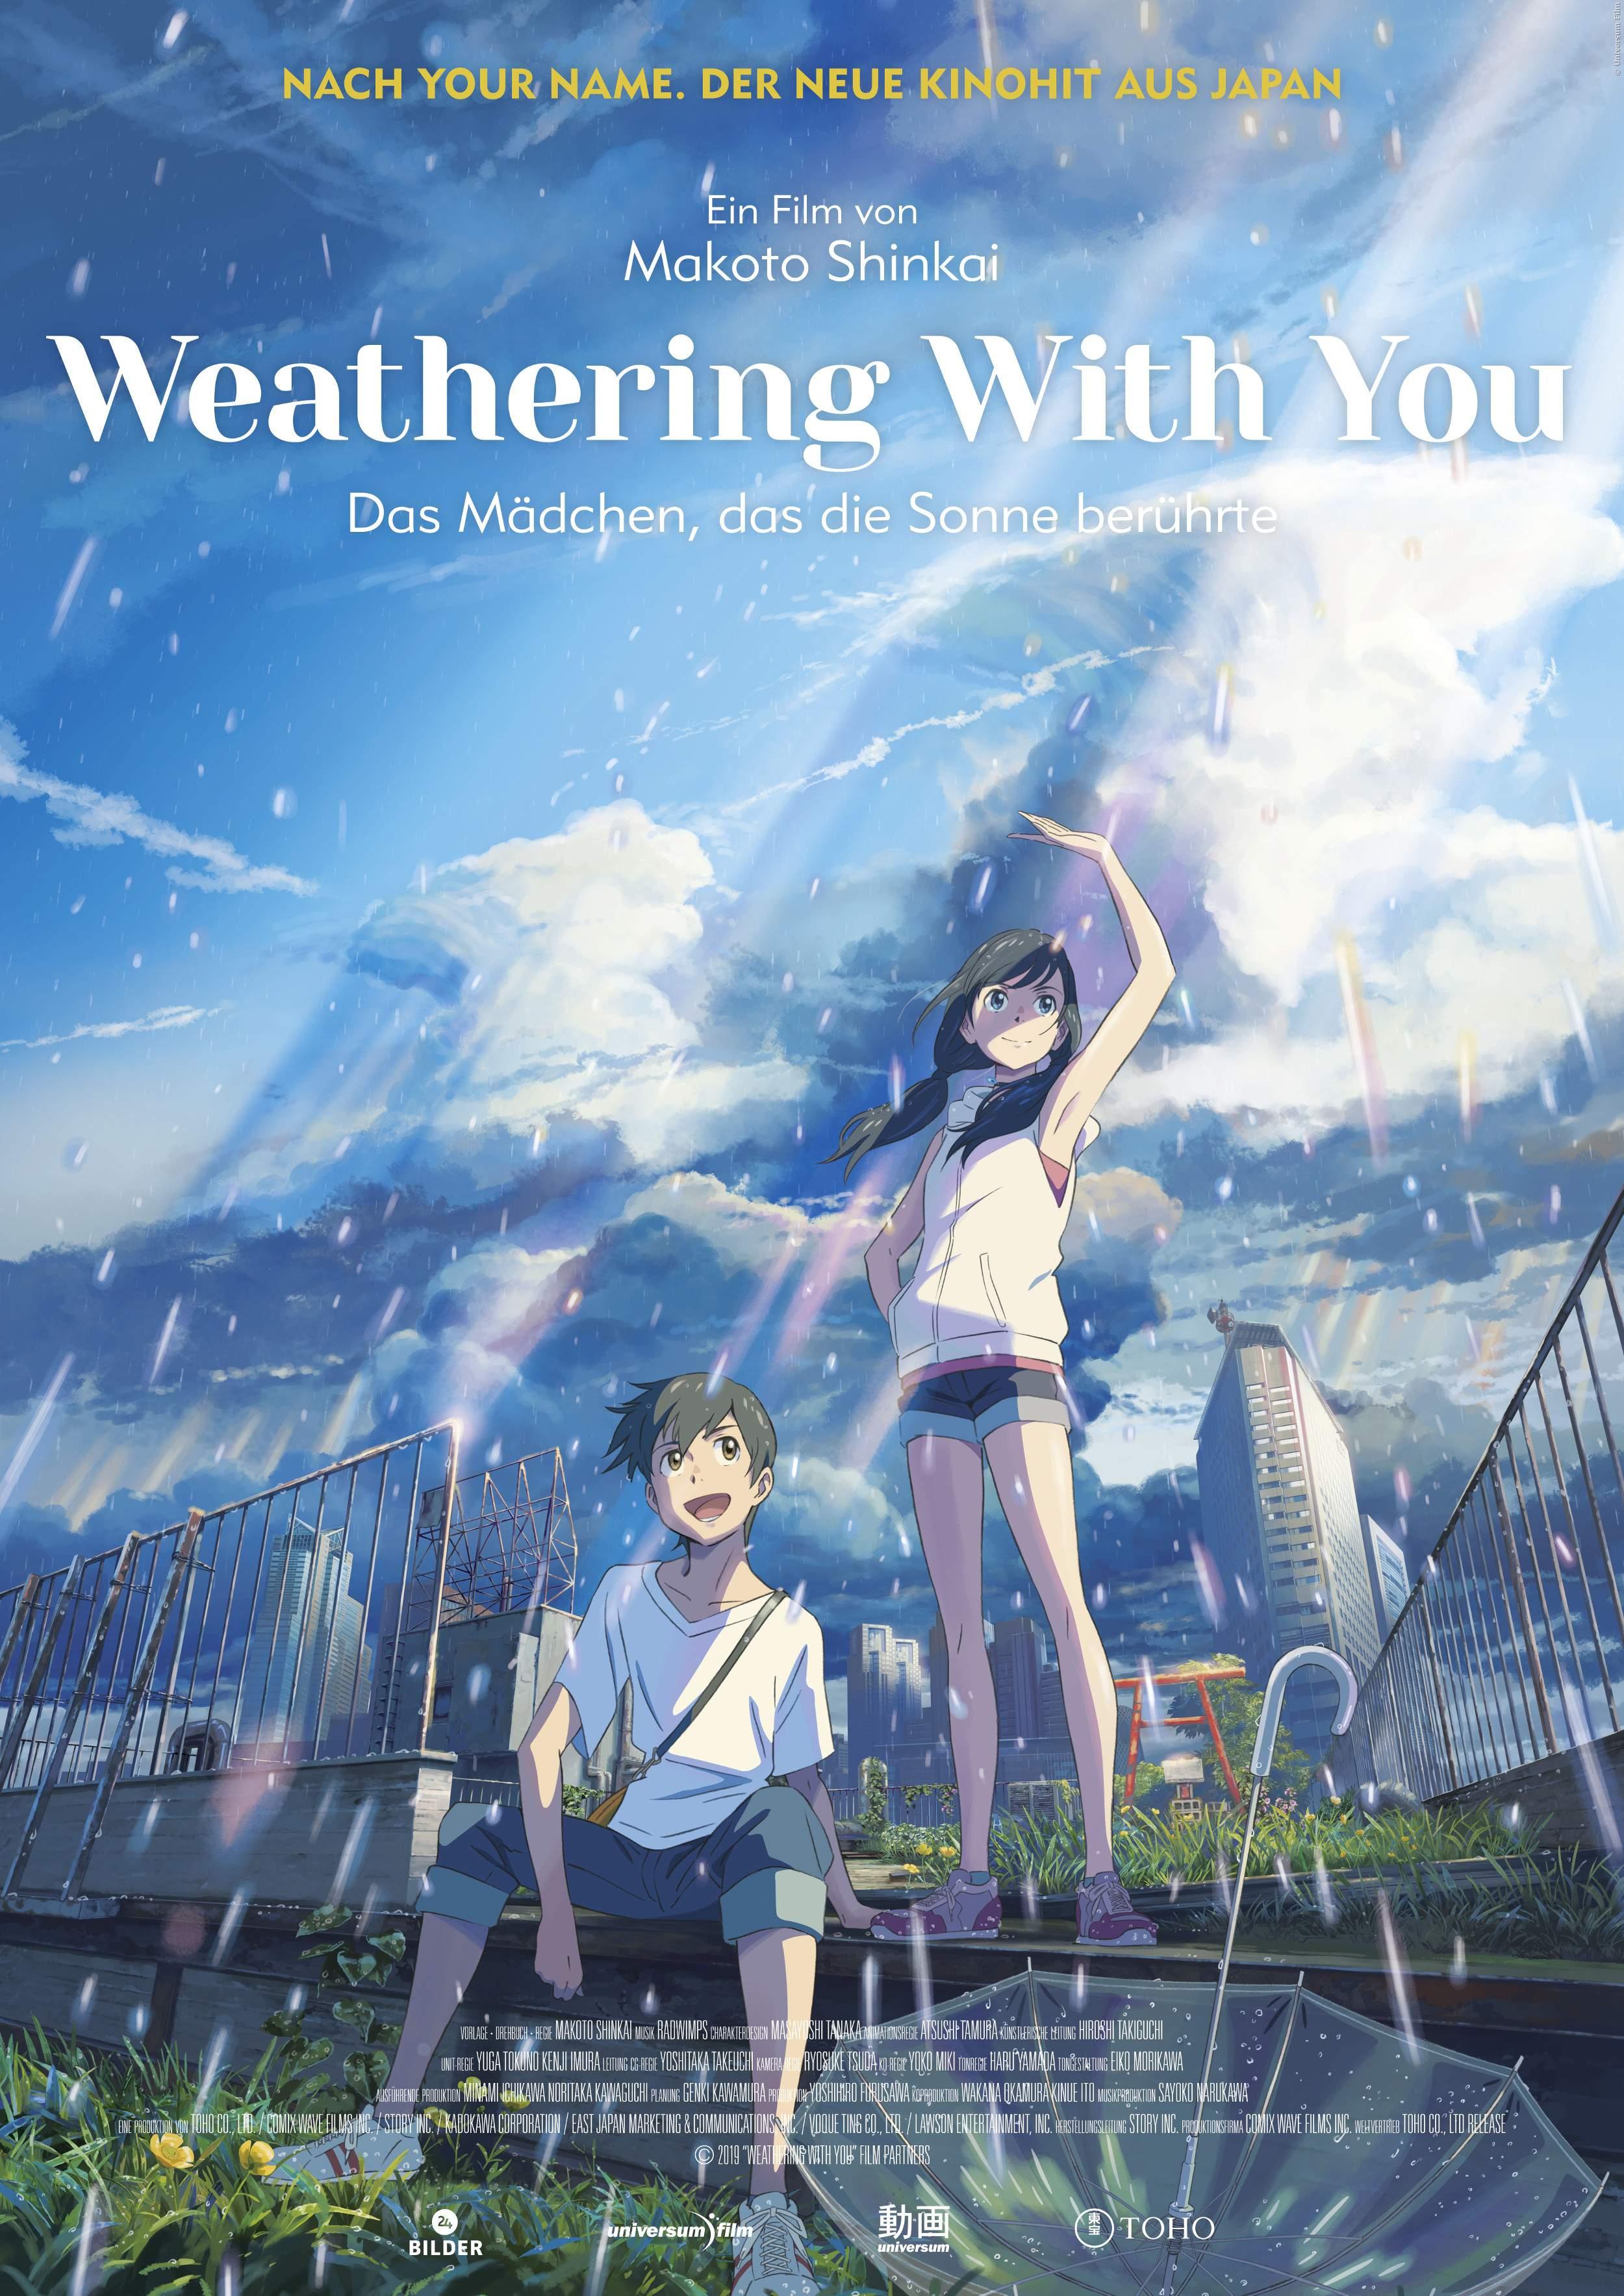 Animé und Manga by FILM.TV - cover